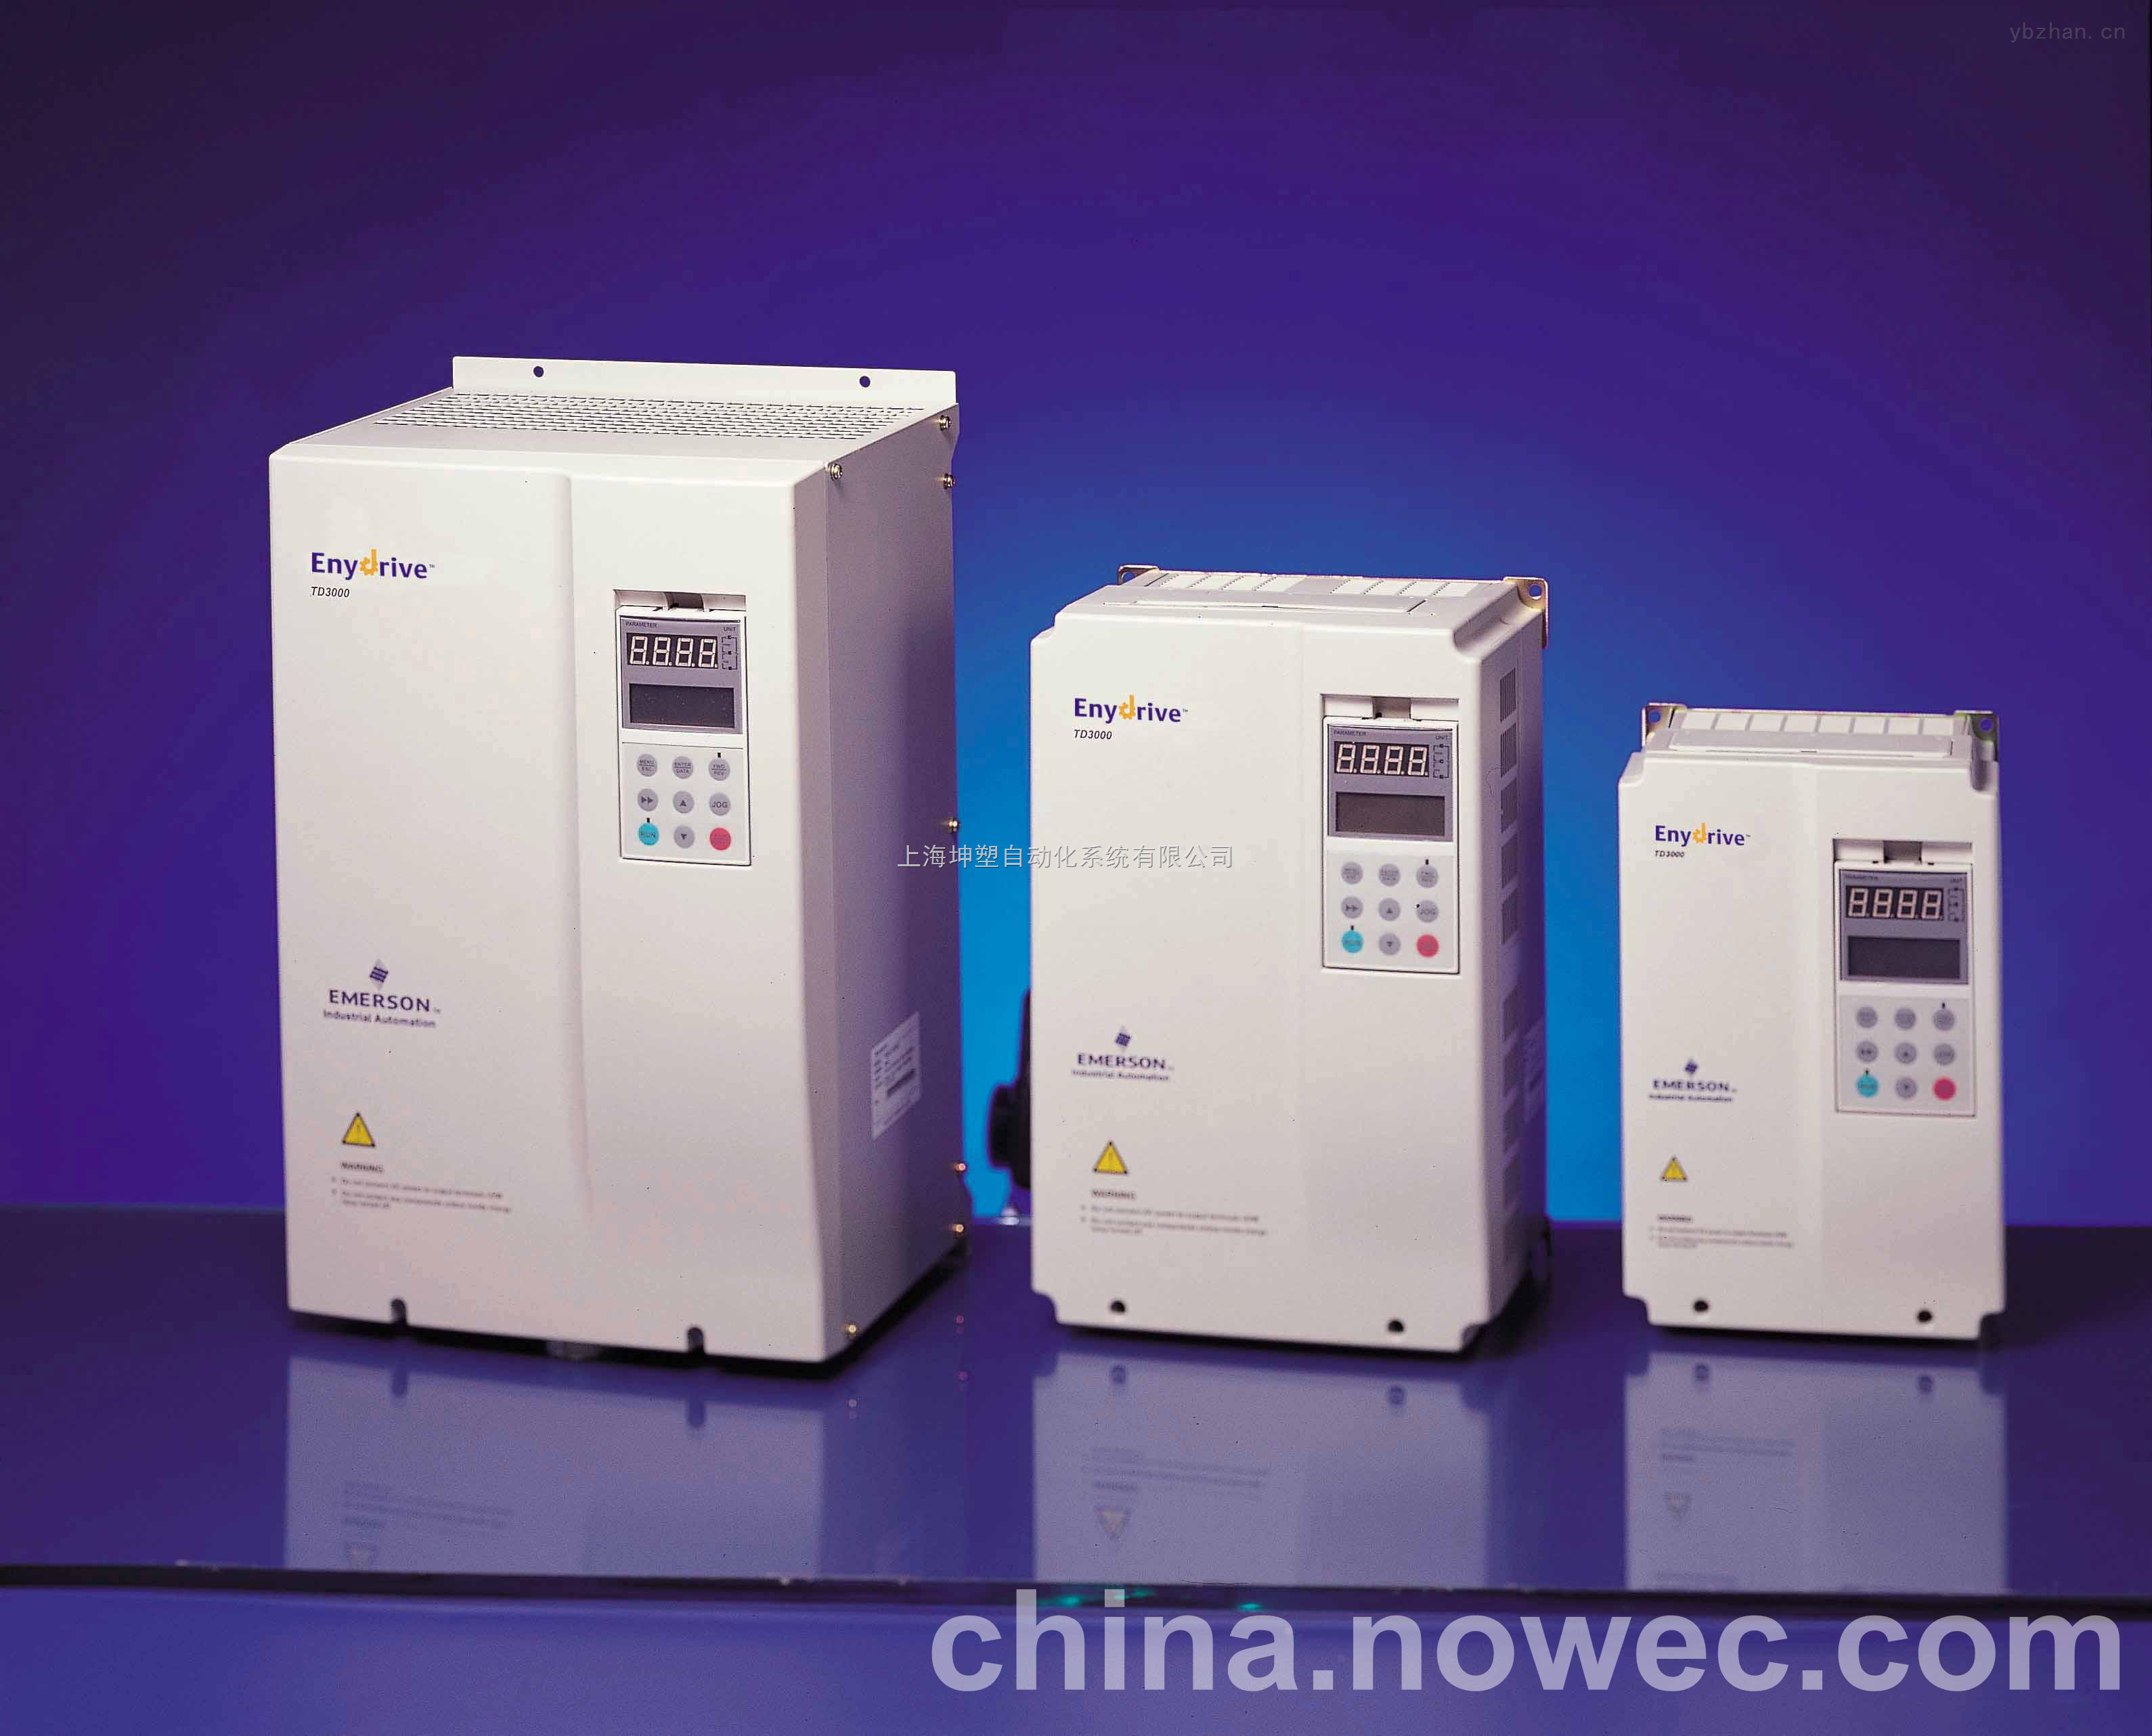 td3100系列(三相,380v,电梯专用变频器)型号 功率(kw)td3100-4t0075e